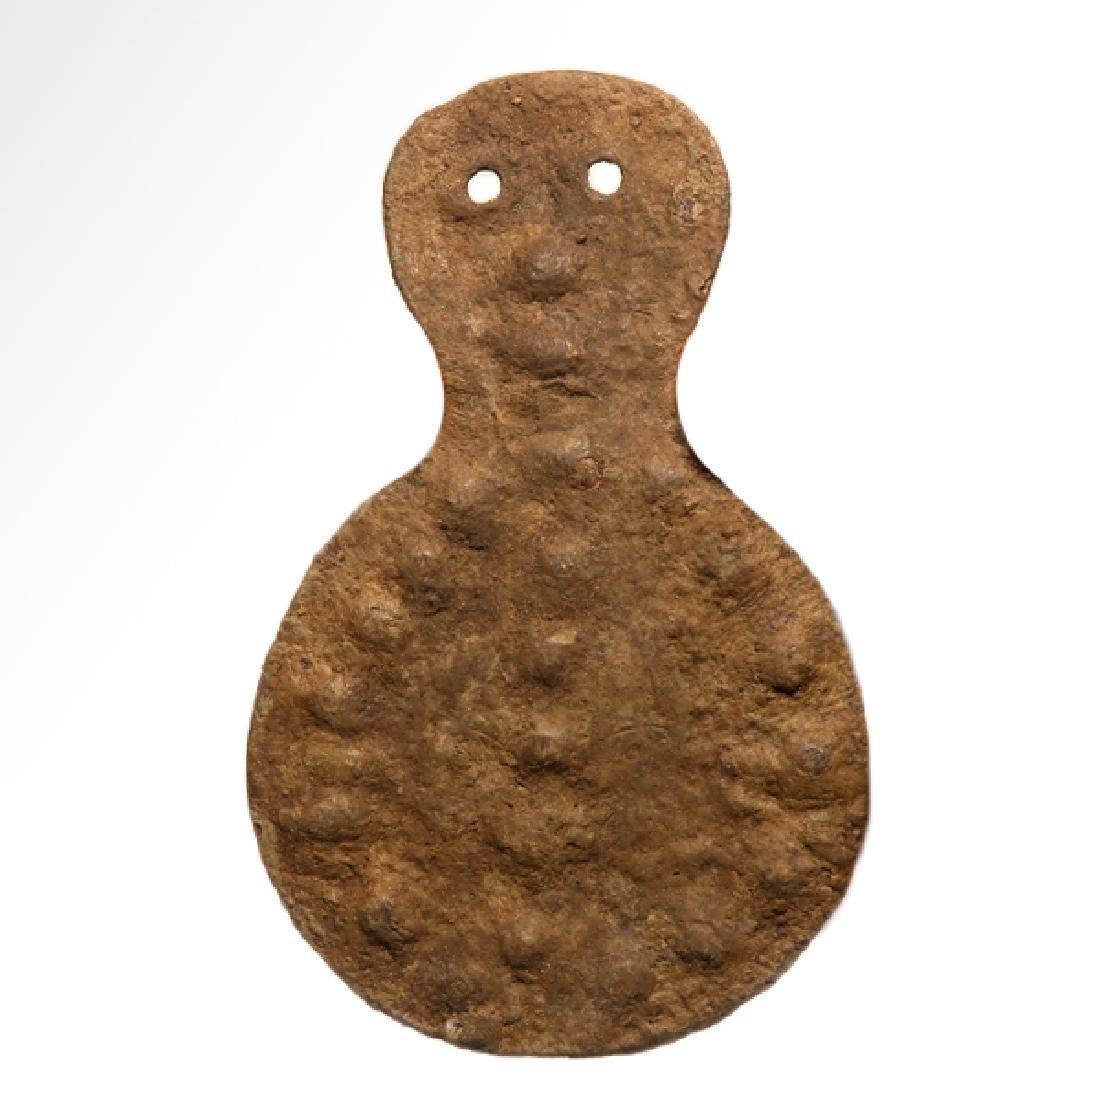 Anatolian Bronze Mother Godess Idol, c. 2500 B.C.